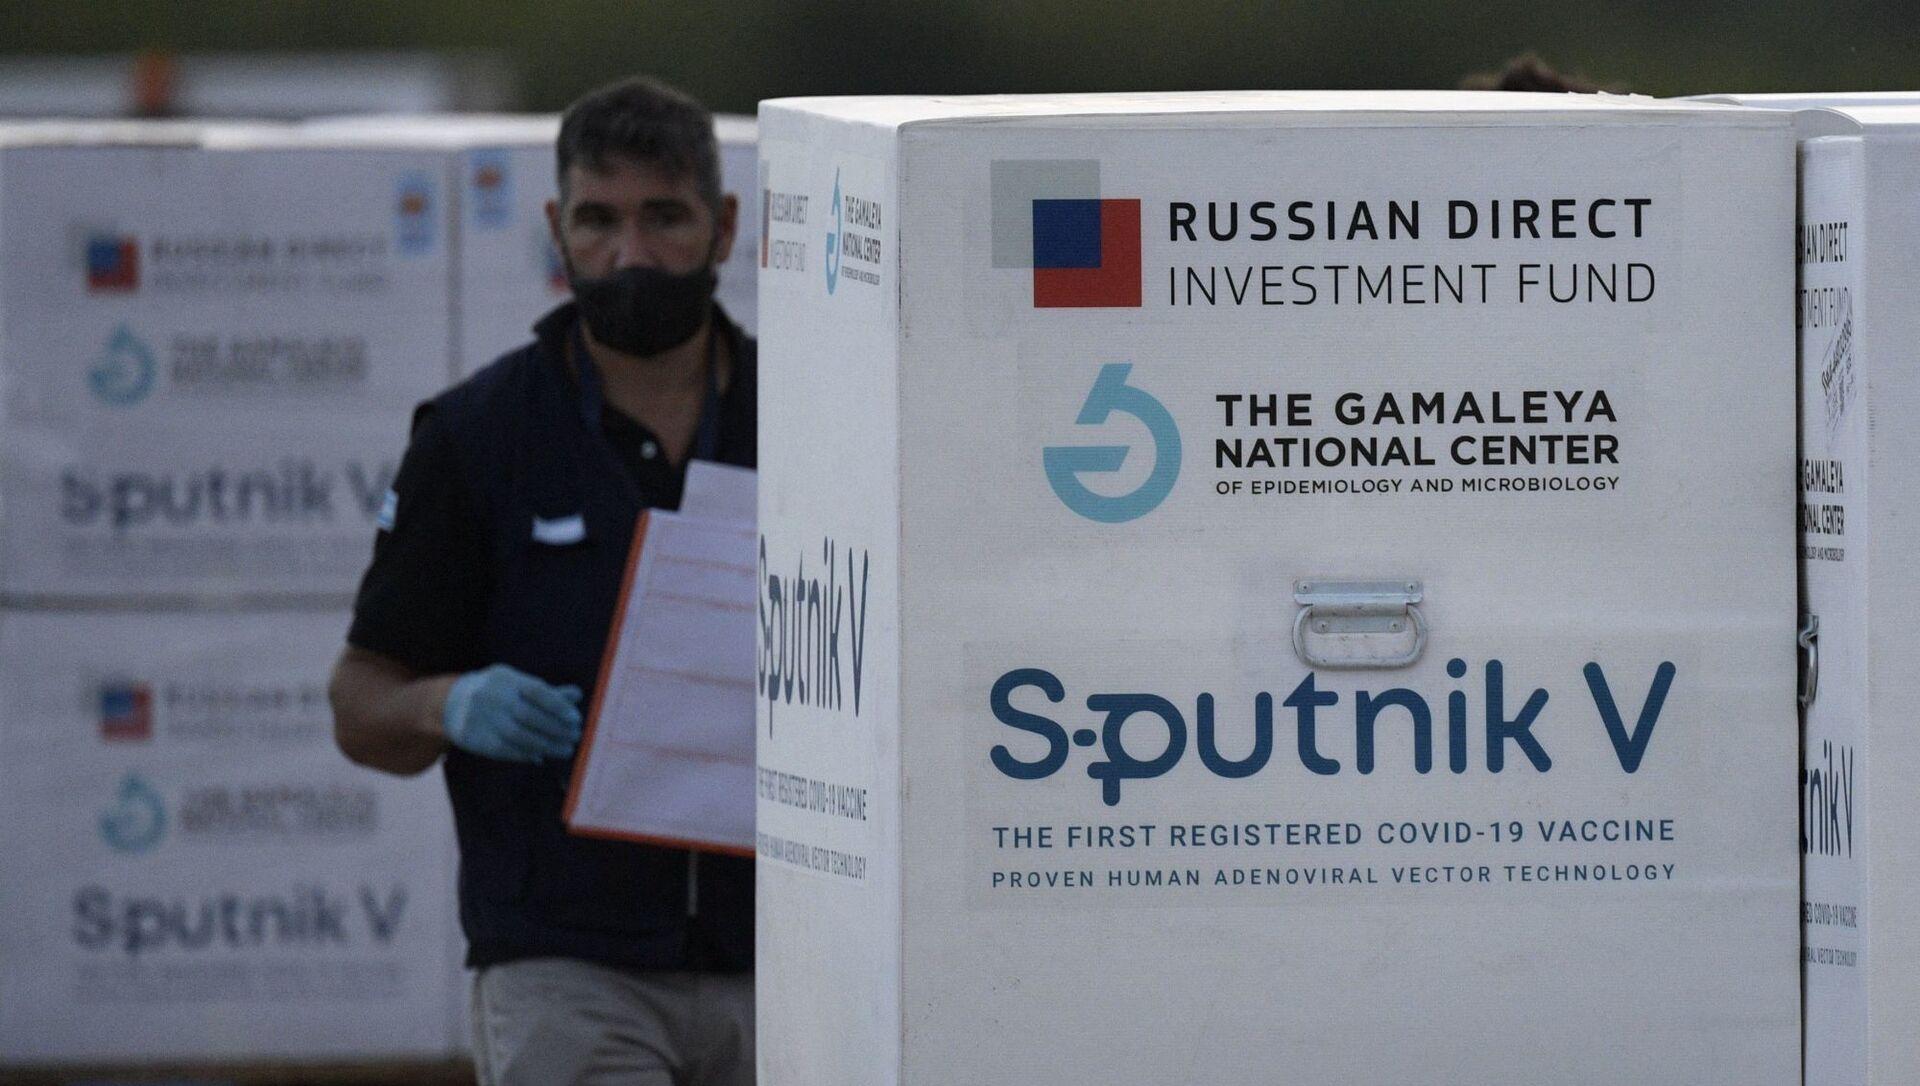 Партия вакцины Sputnik V, фото из архива - Sputnik Азербайджан, 1920, 07.04.2021